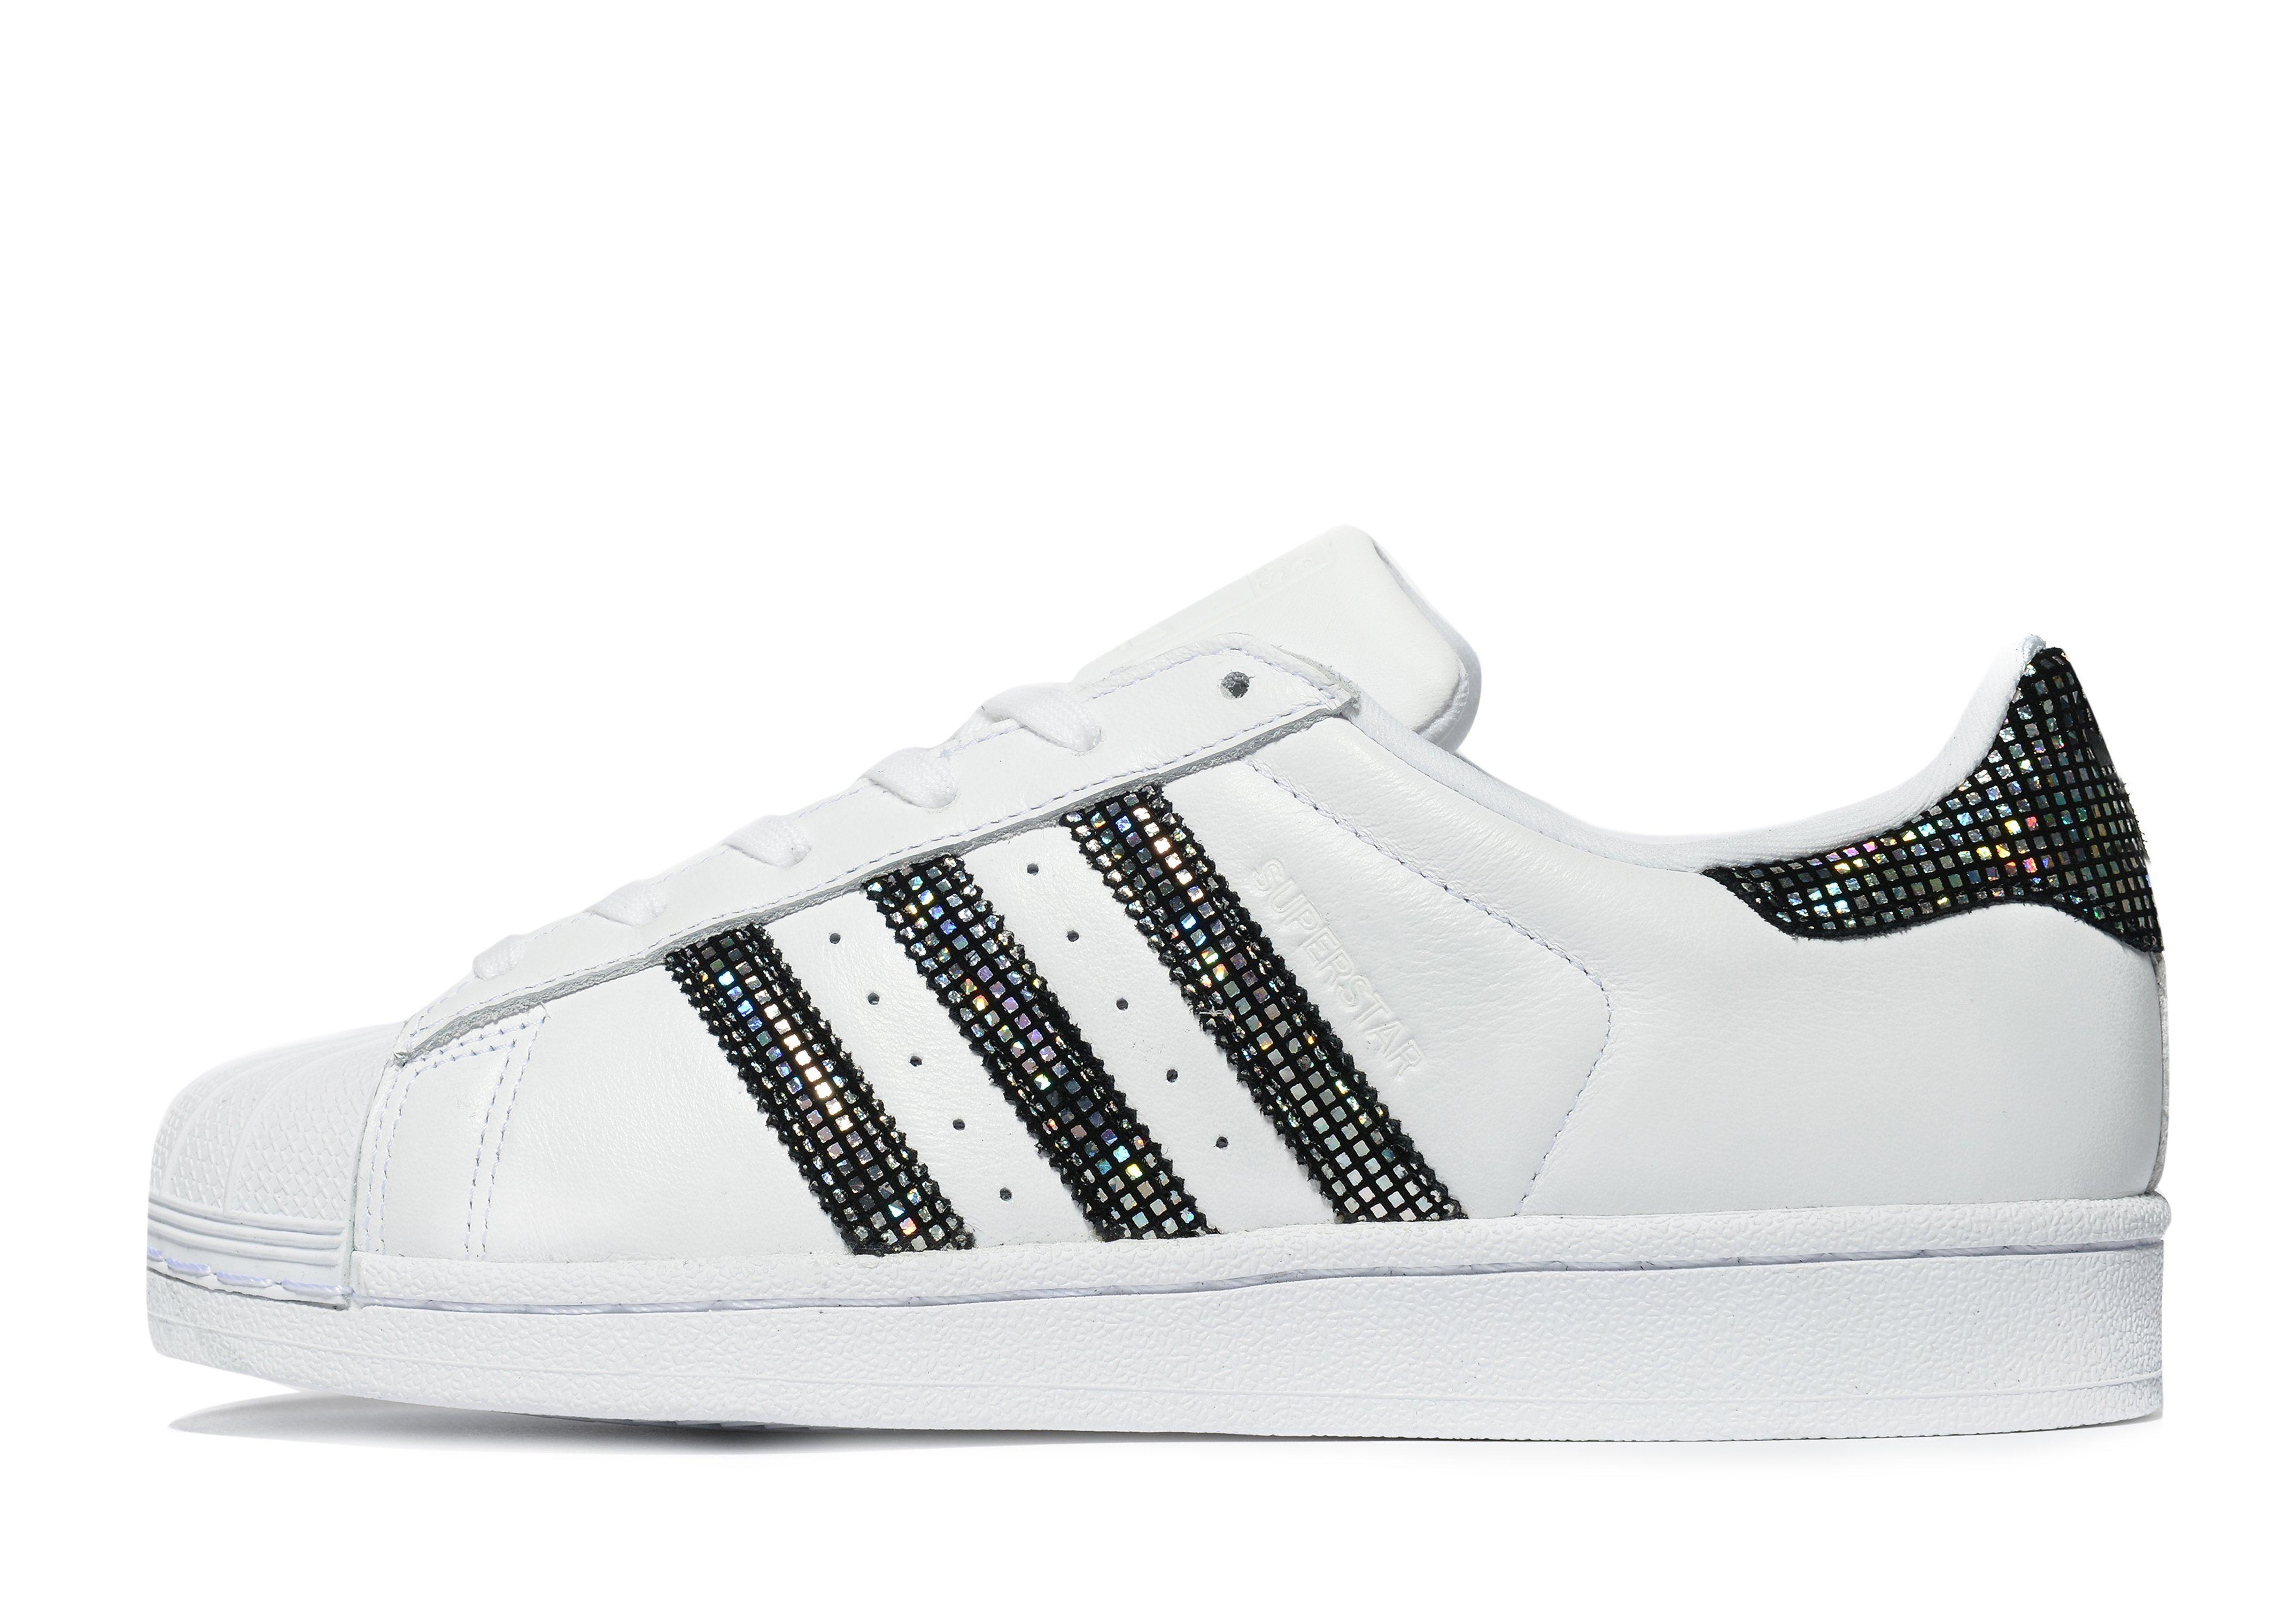 Adidas Superstar Beach Foot Locker ChaussureAdidasonlineoutlet.